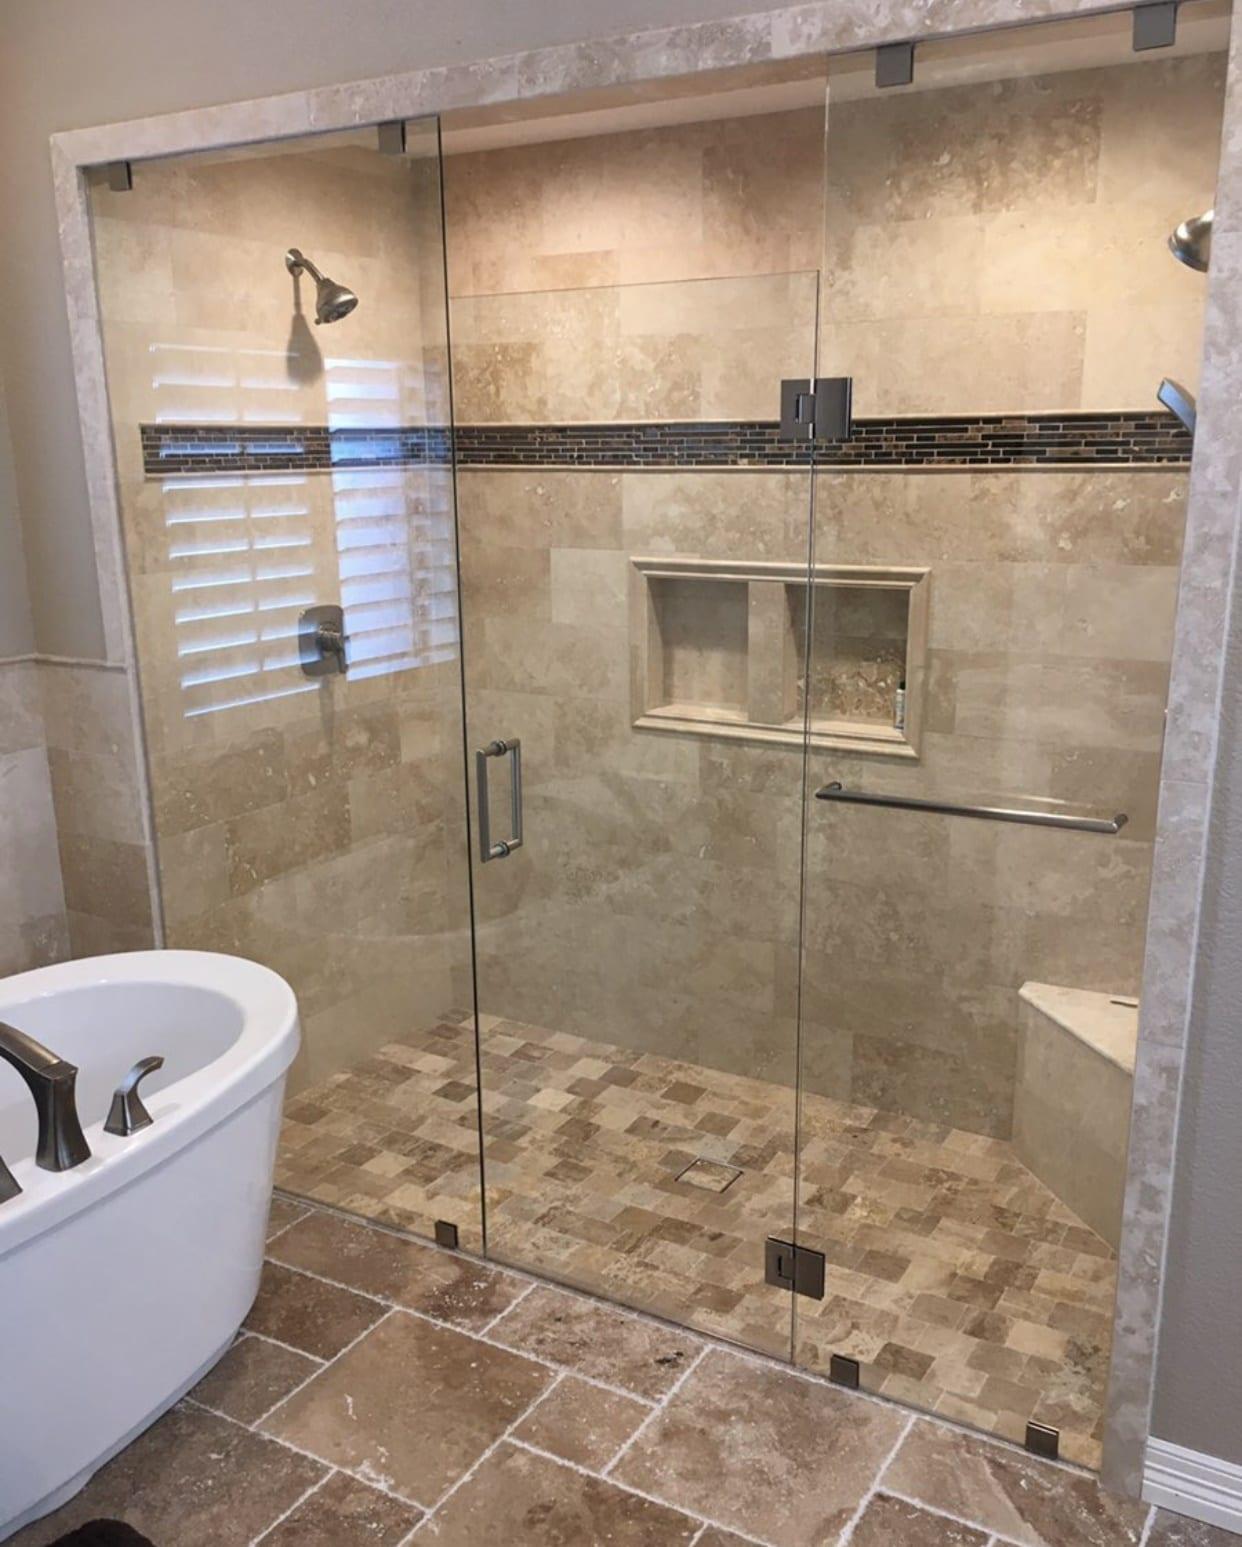 frameless shower doors img 2164 custom bathroom mirrors and decorative glass from Shower Doors of Nashville